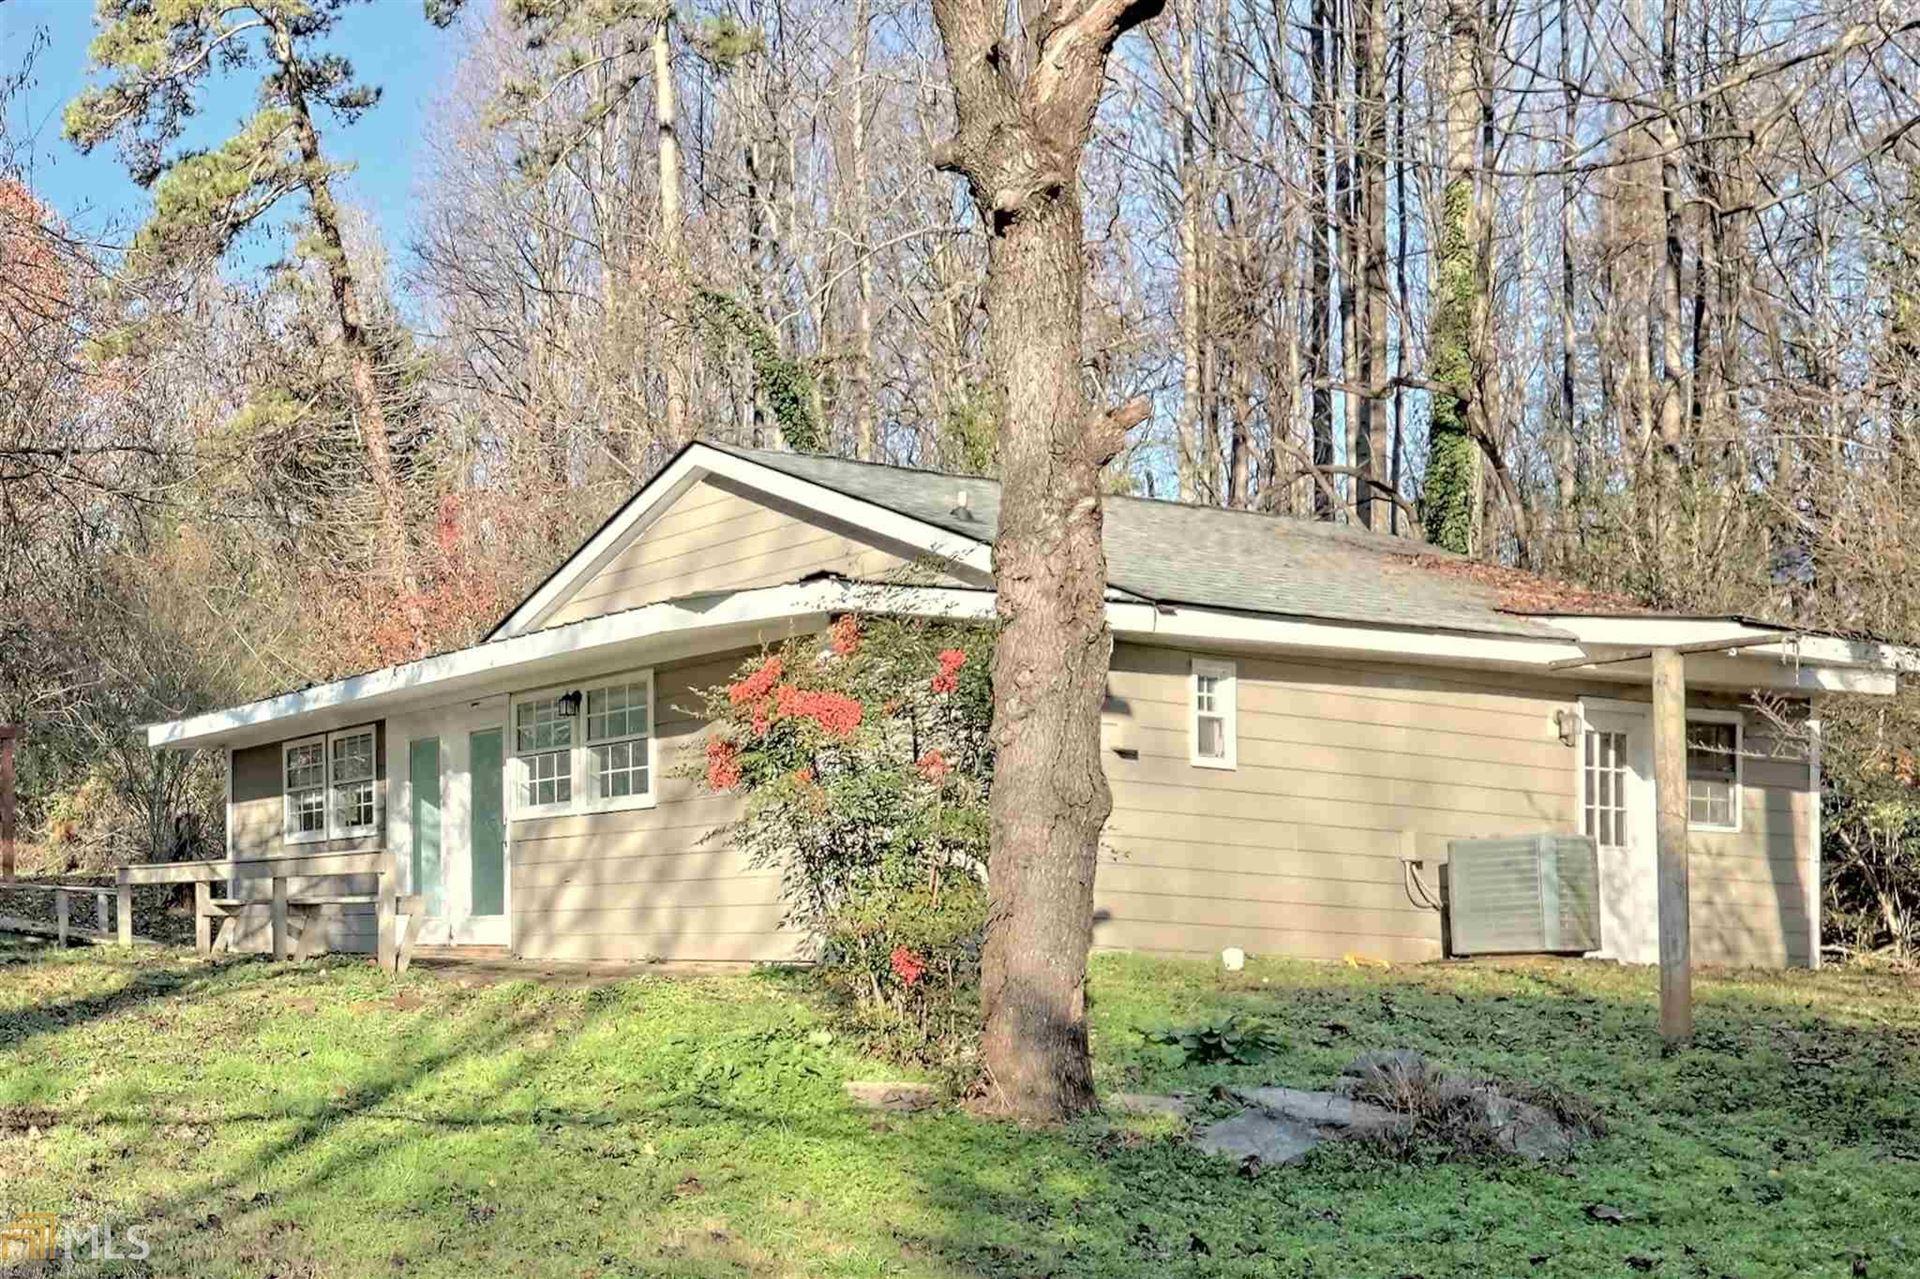 3979 C Rogers Rd, Gainesville, GA 30506 - MLS#: 8902413